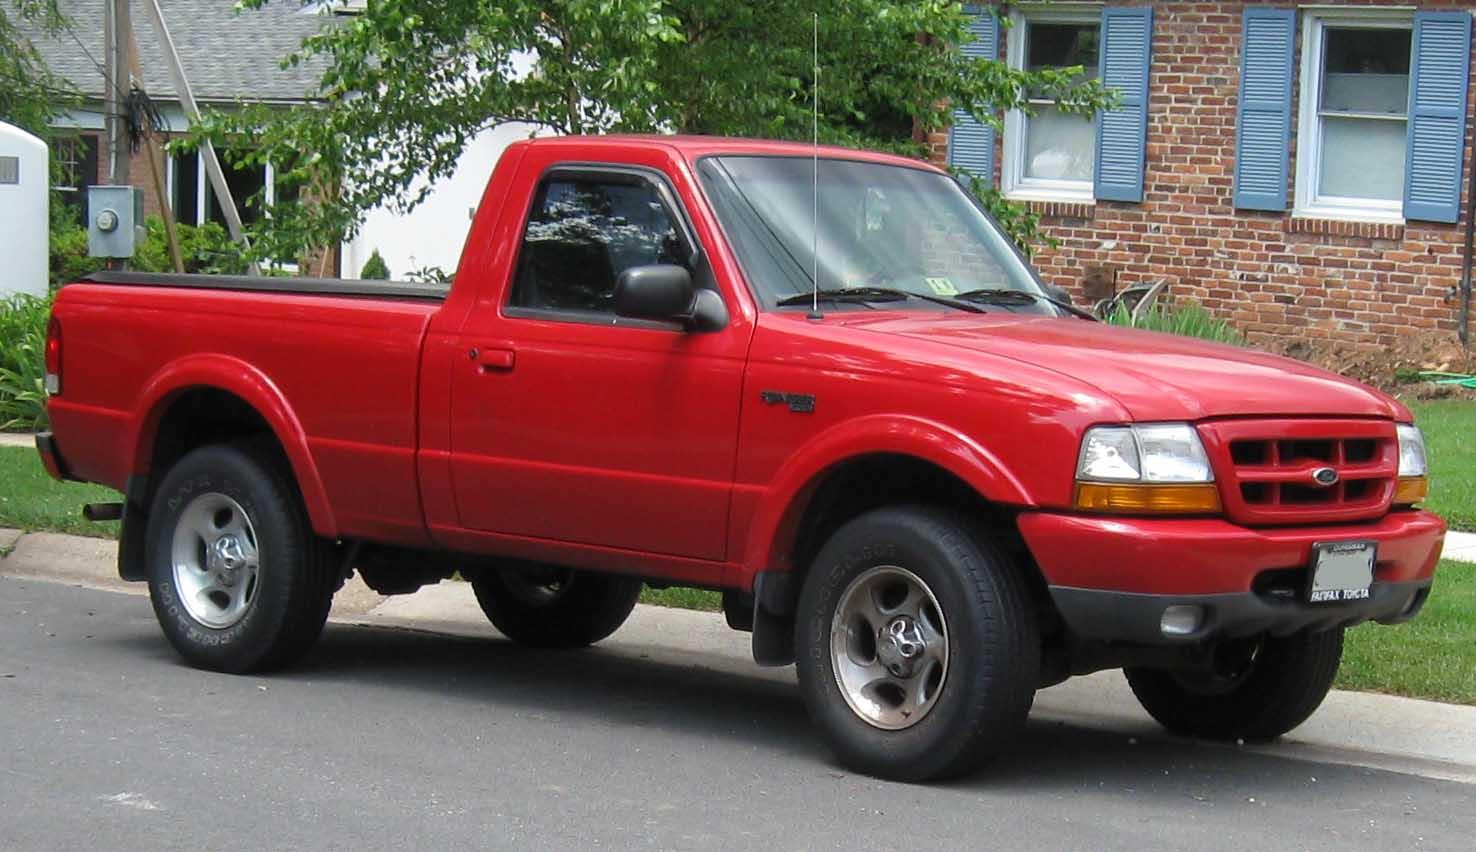 2008 Ford Ranger VIN Check, Specs & Recalls - AutoDetectiveAutoDetective